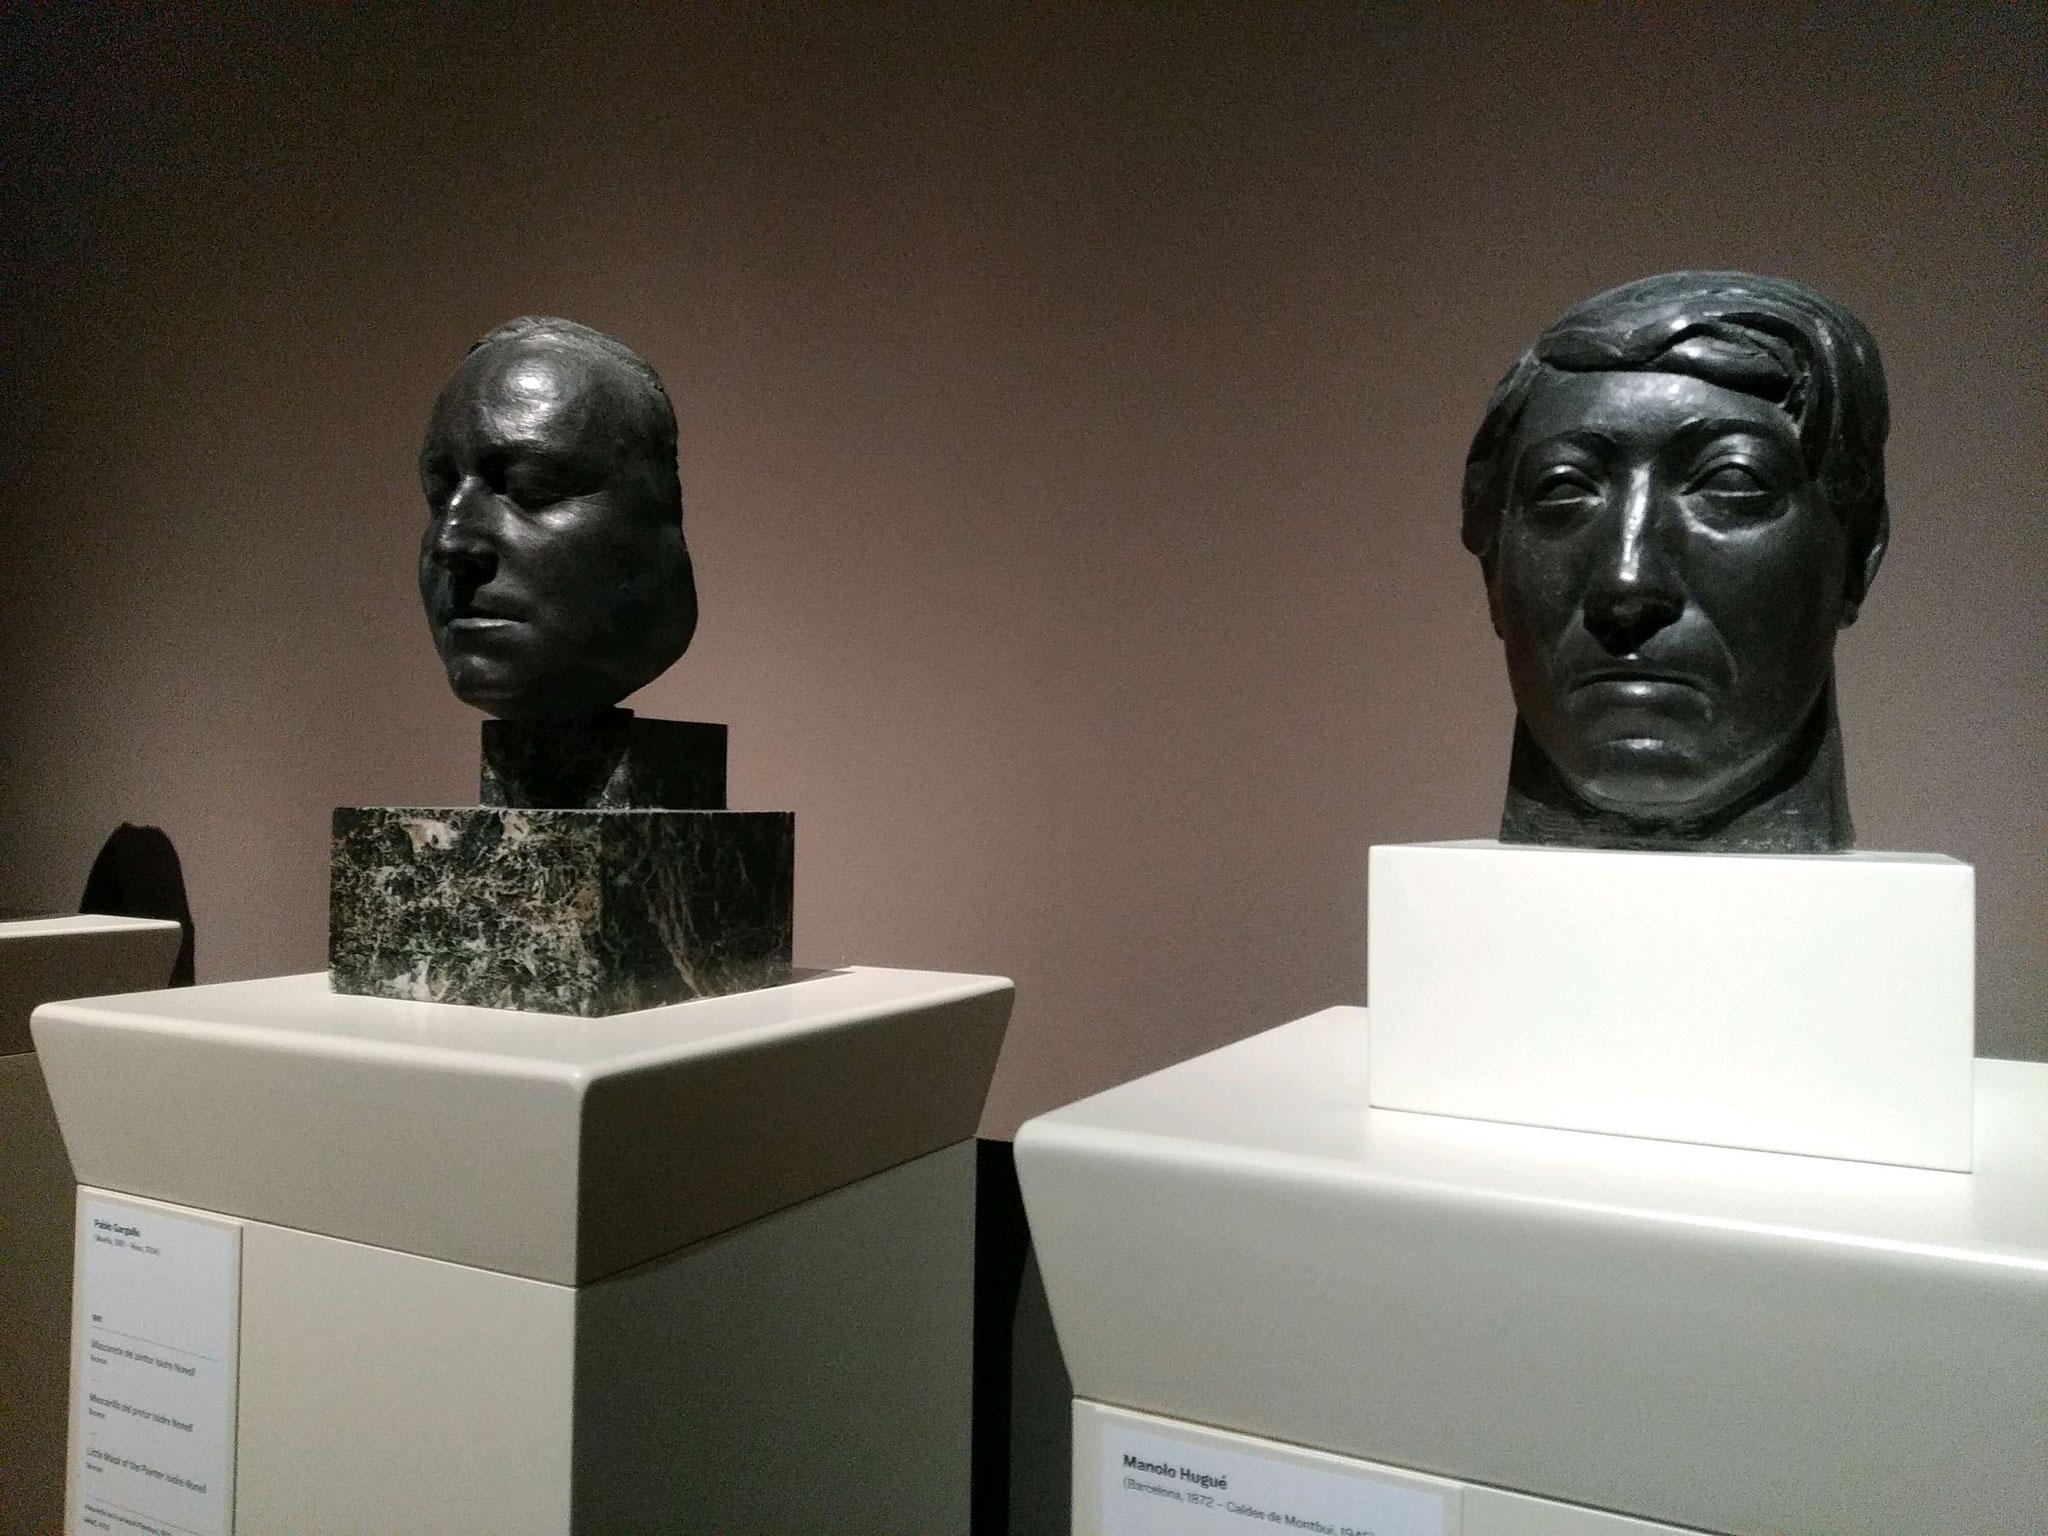 Escultures de bustos a les sales d'Art Modern